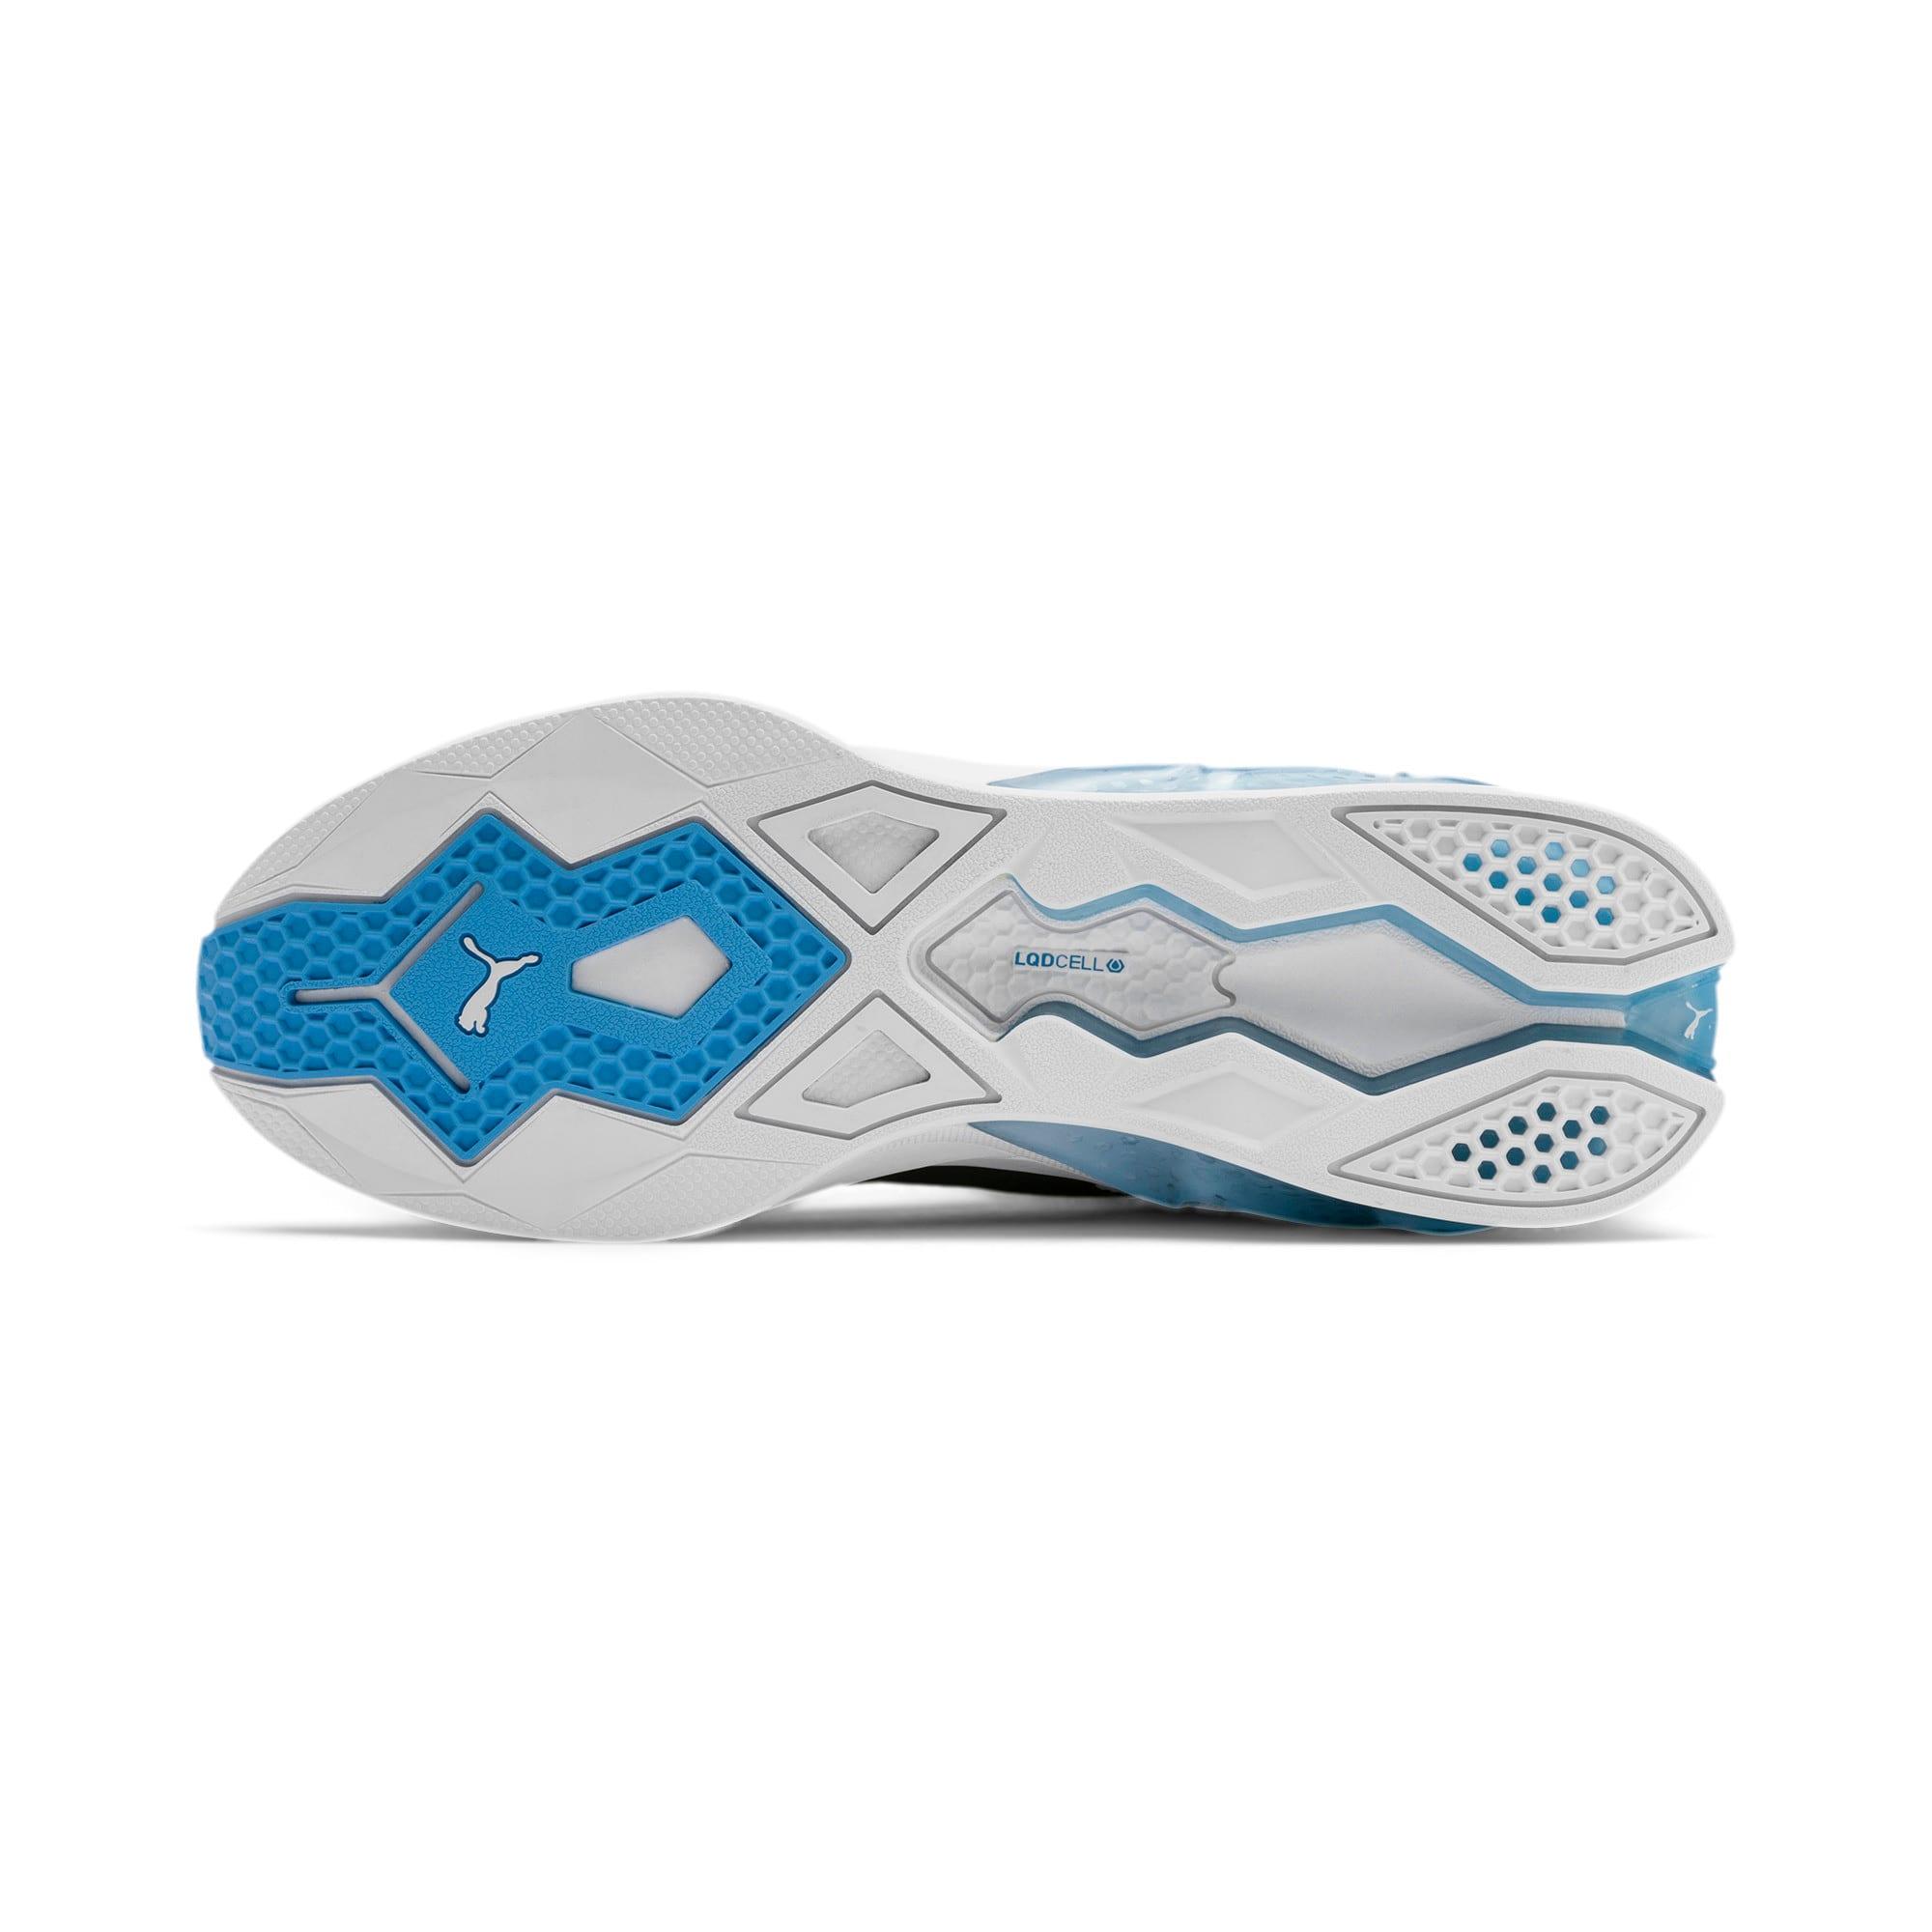 Thumbnail 5 of LQDCELL Origin Men's Training Shoes, Puma White-Puma Black, medium